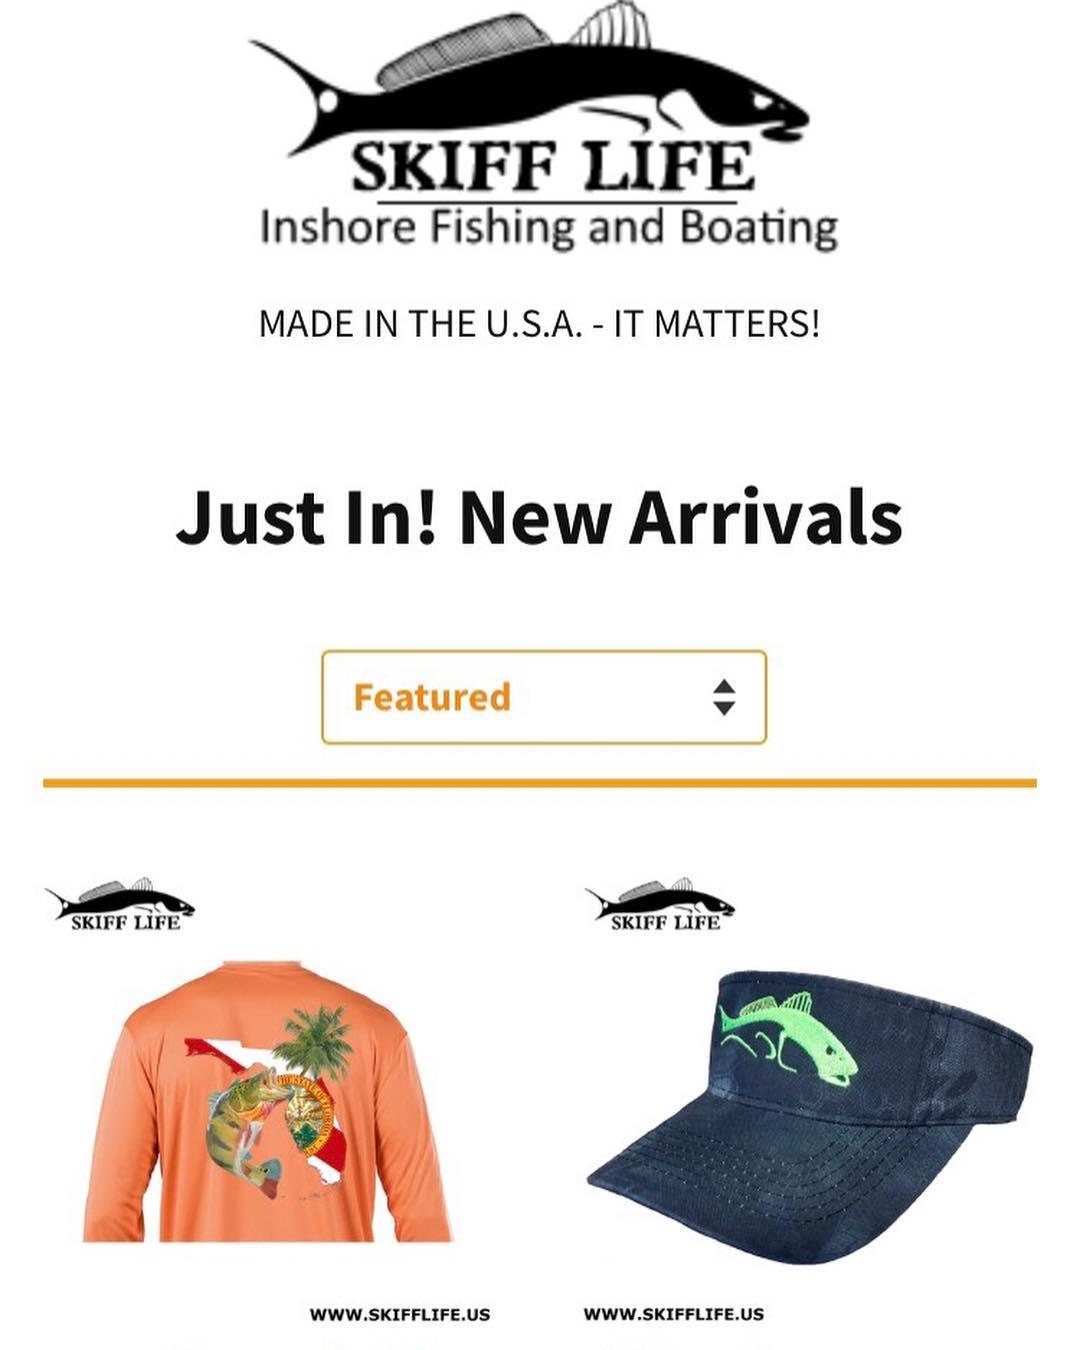 New merch in stock! www.skifflife.us